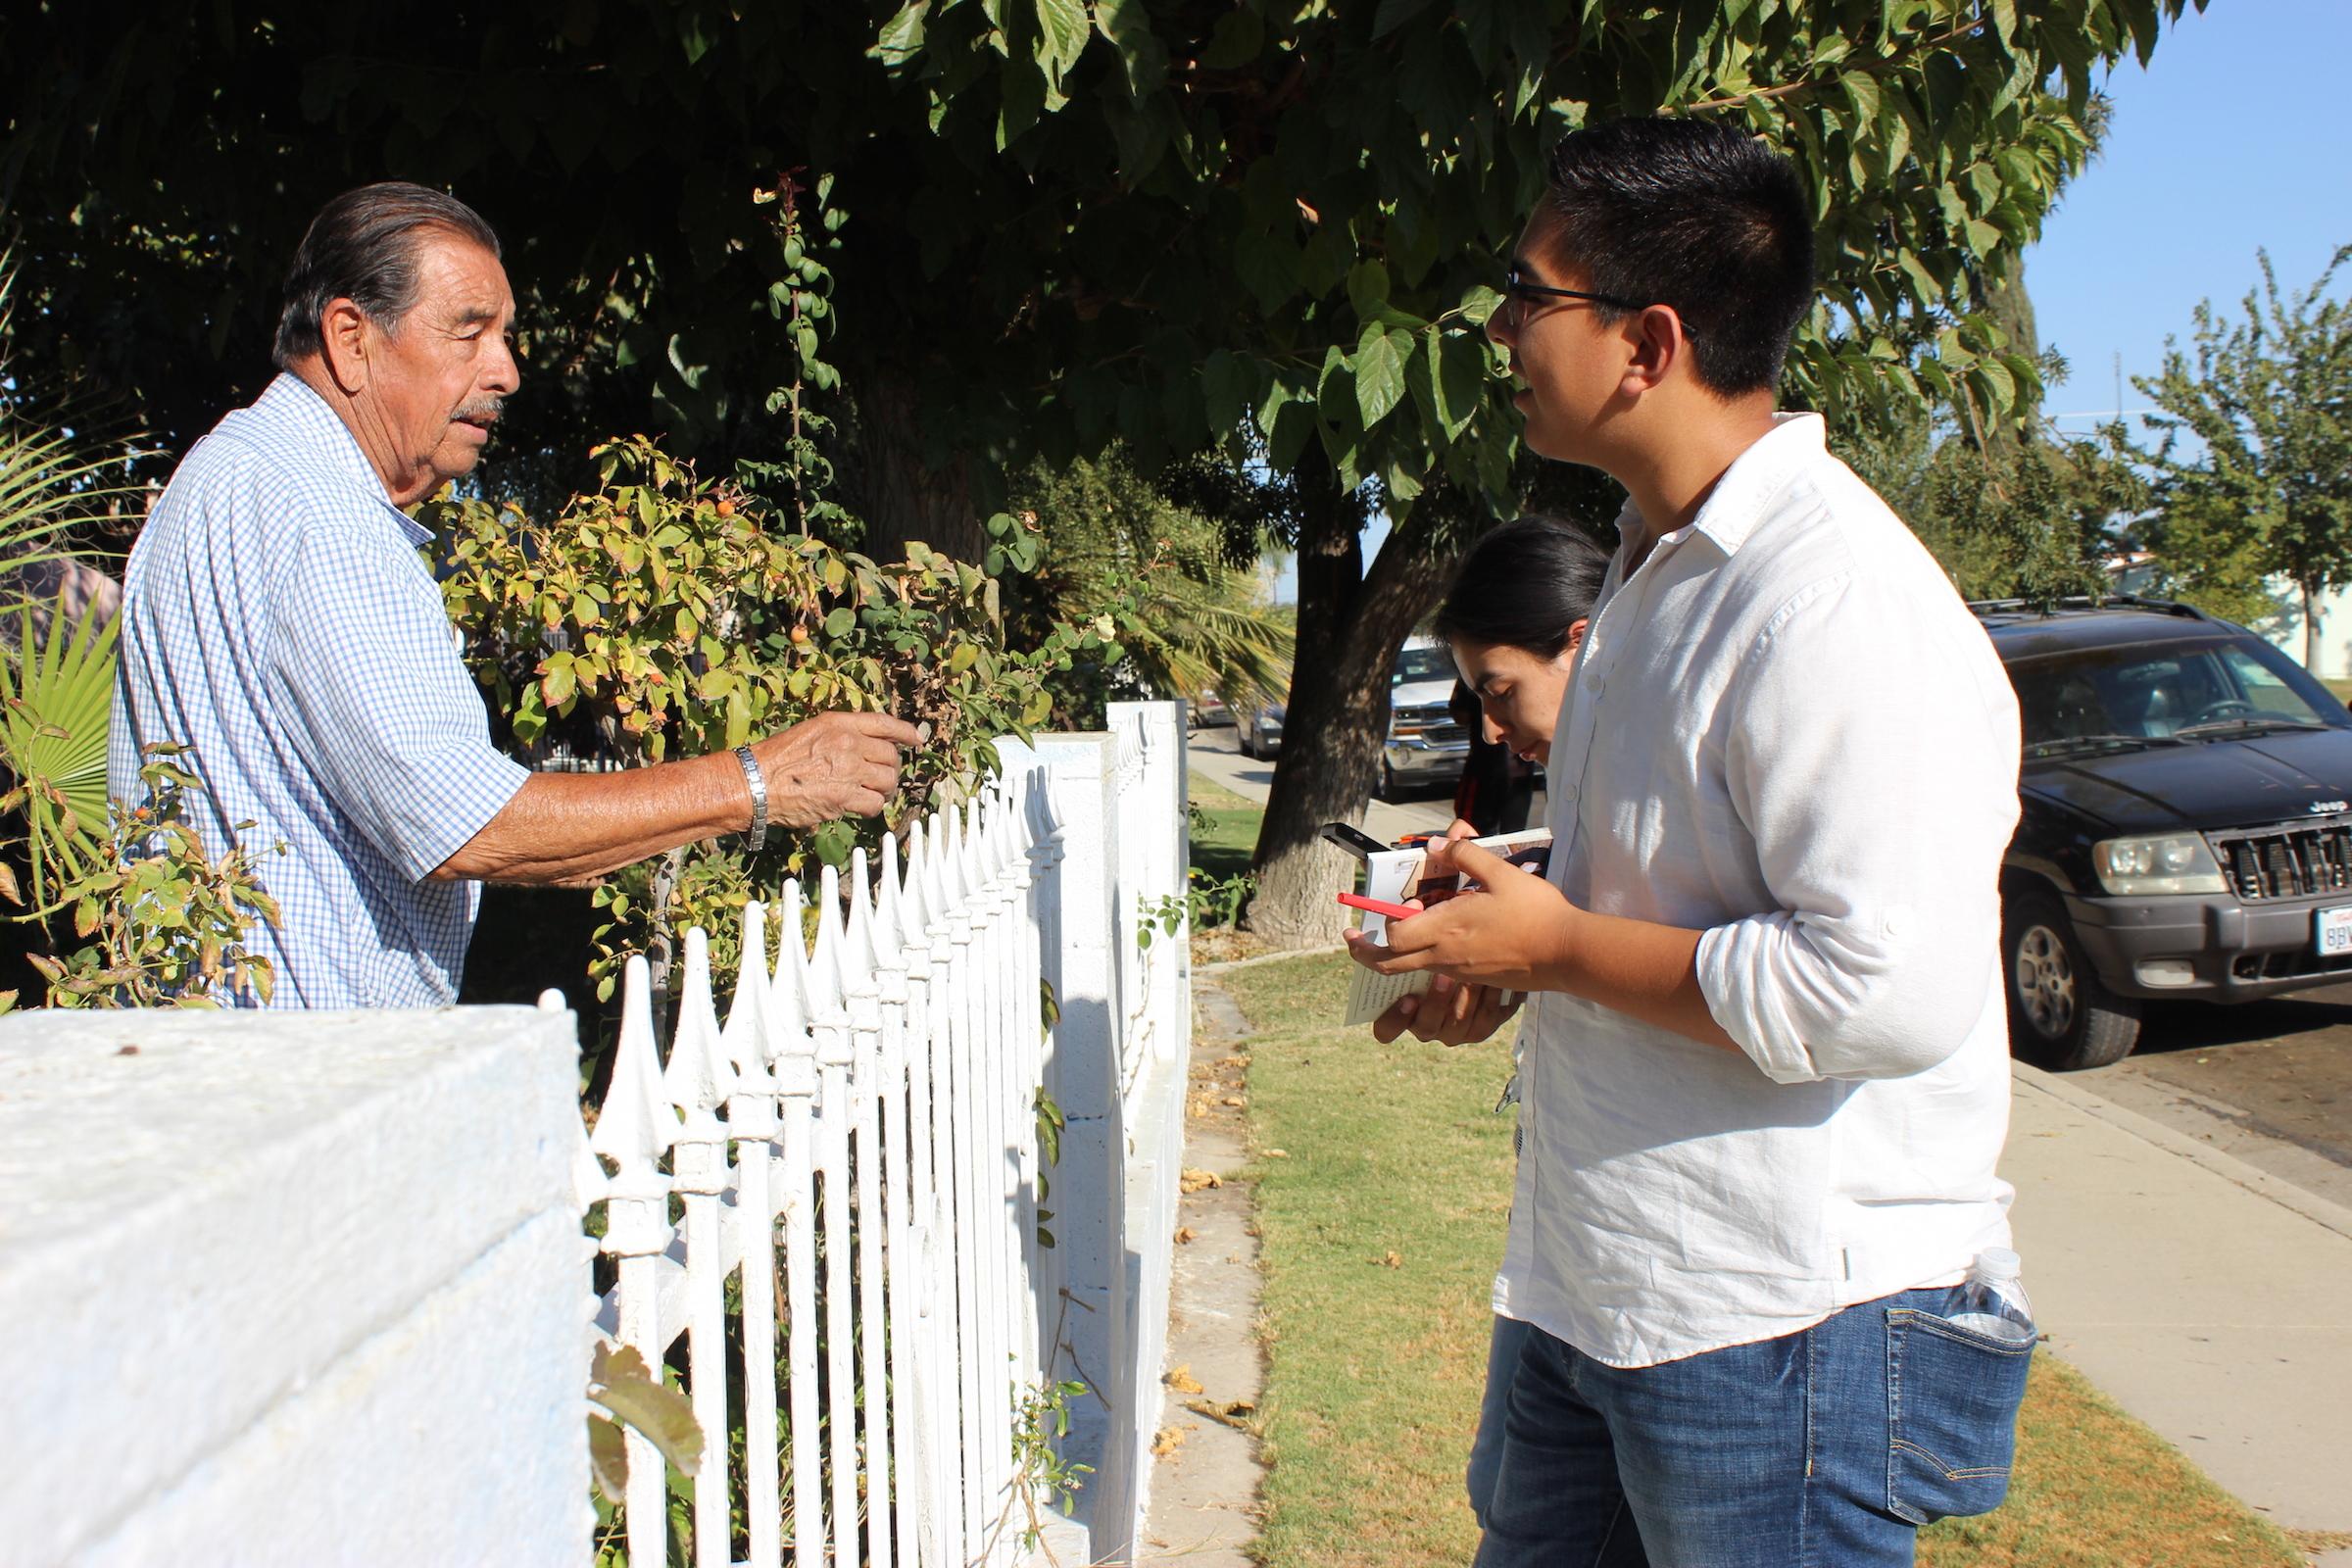 Bryan Osorio, 22, of Delano, talks to an 80-year-old Delano voter. Osorio is a University of California, Berkeley, graduate